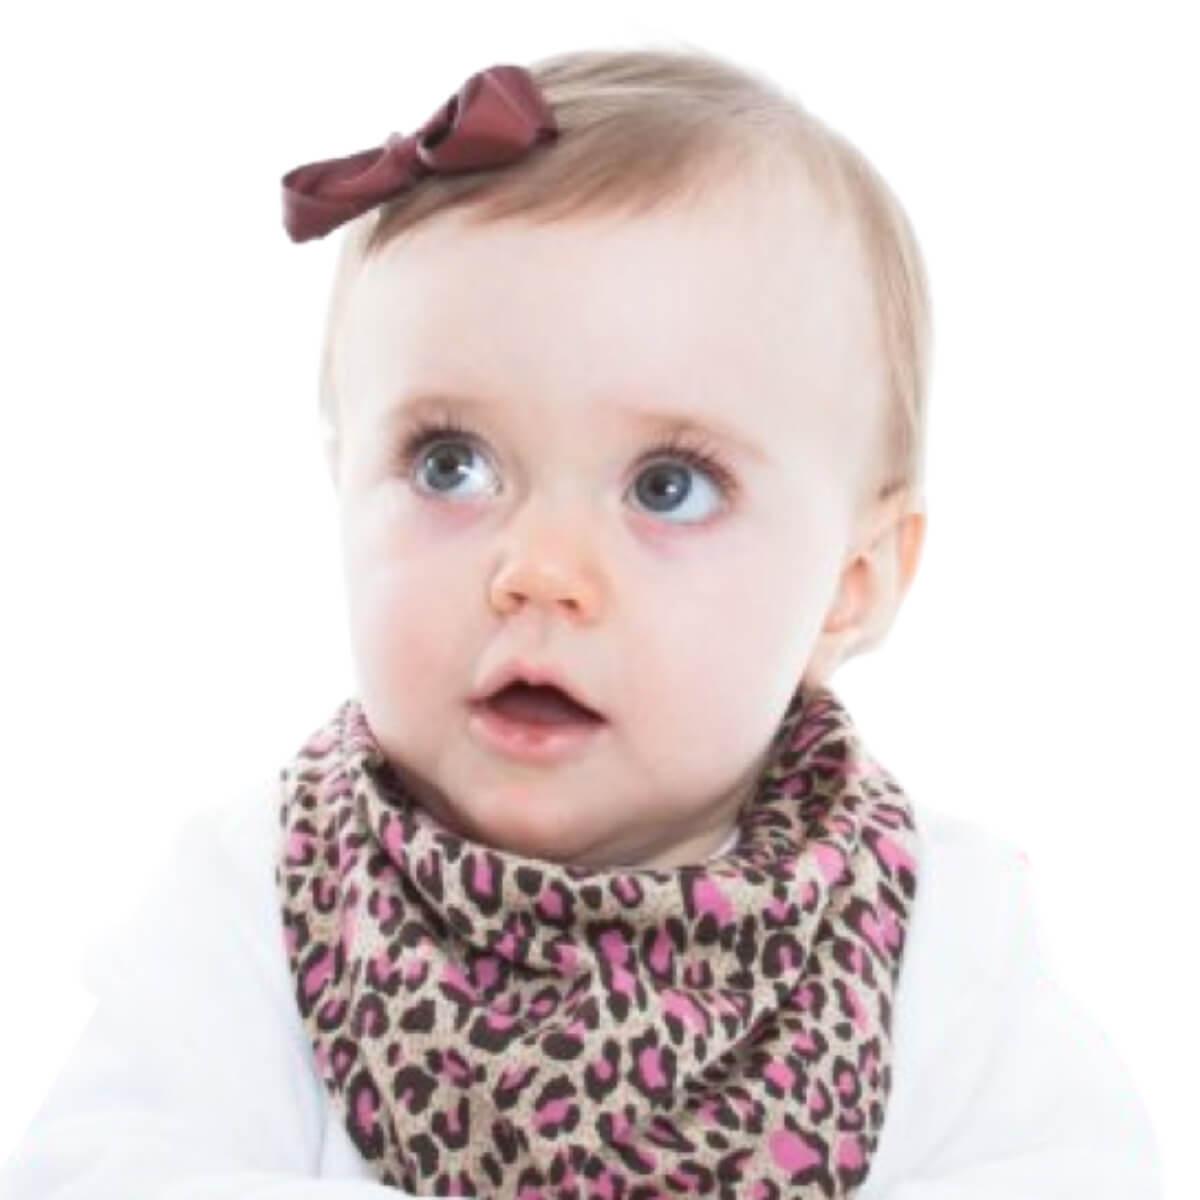 Babador Bandana Gumii Bebe Menina Girl Kit 6 Leve 6 Pague 5